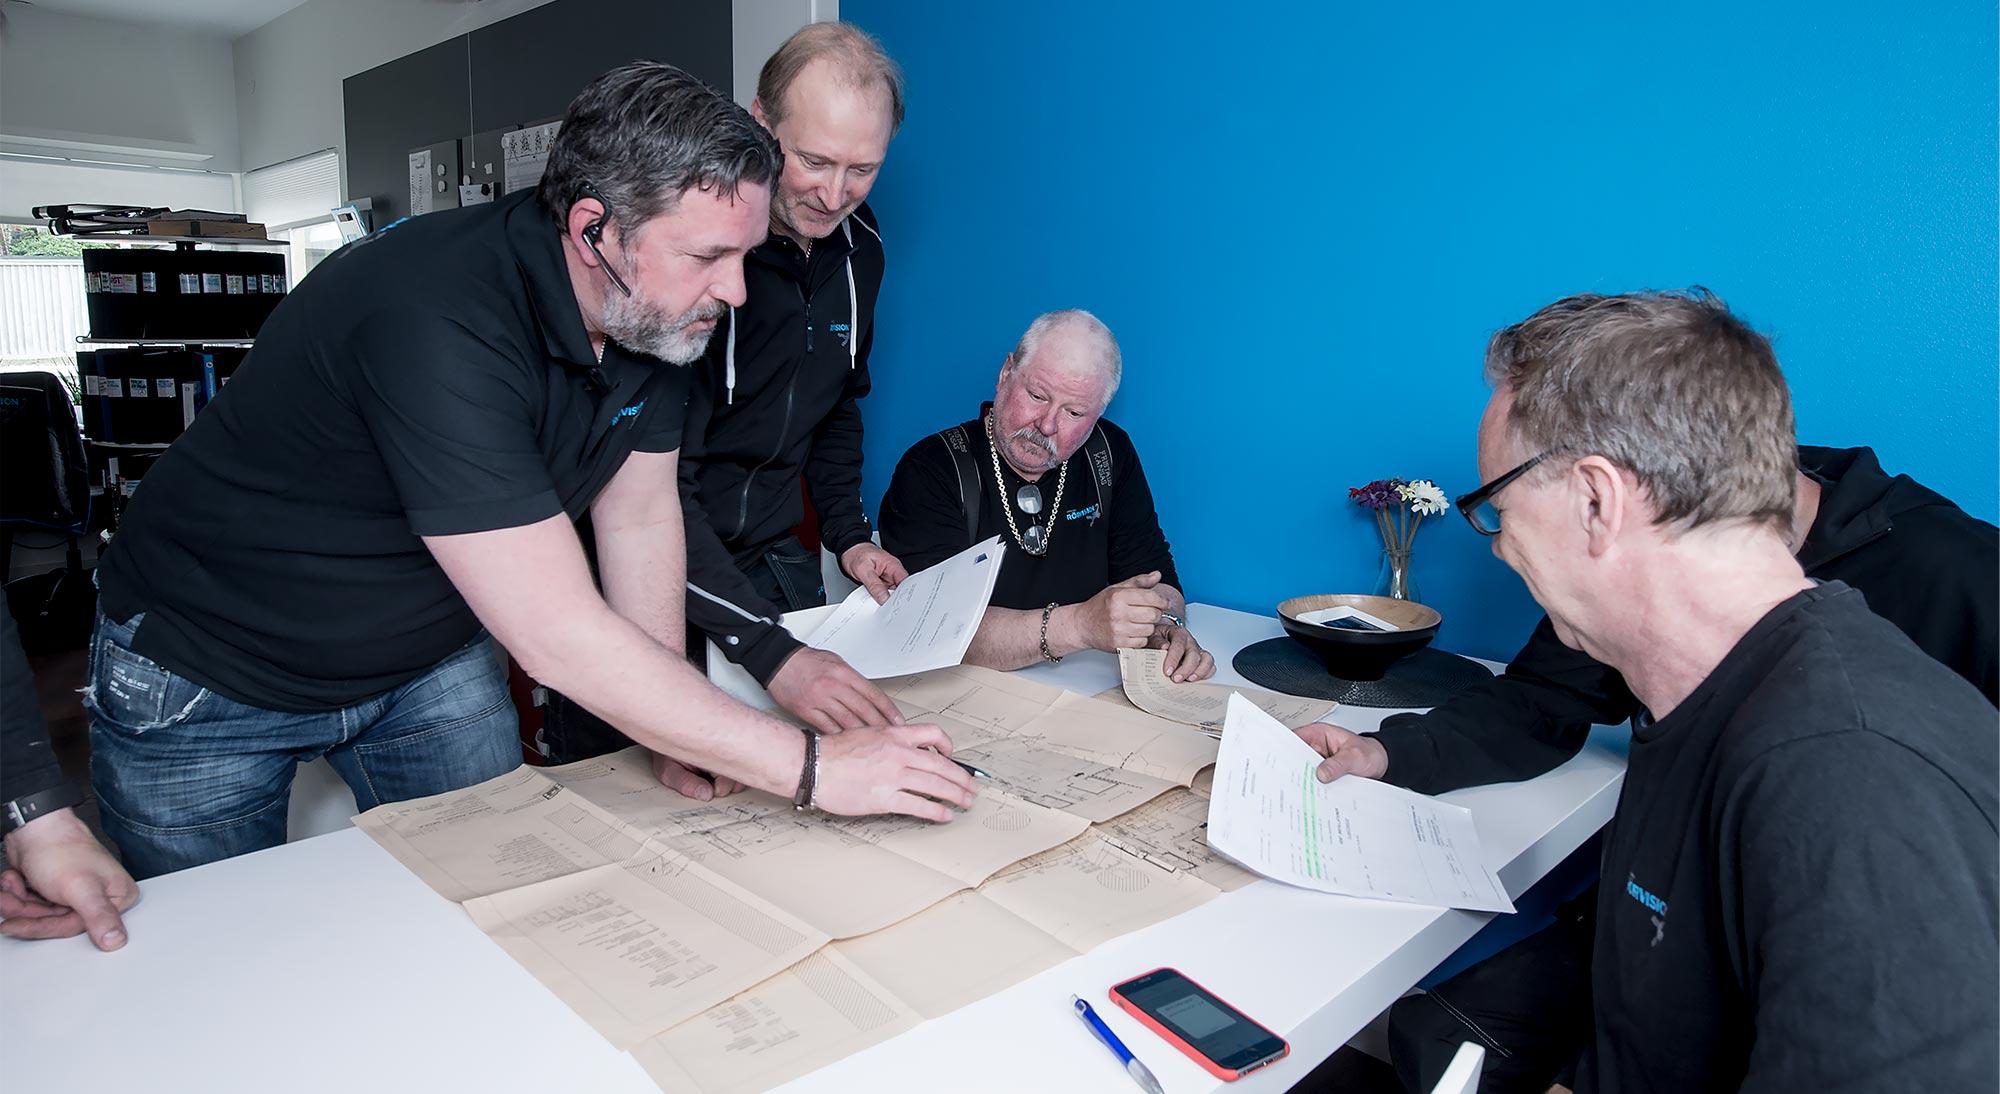 Planering VVS-projekt, Stockholms Rörvision